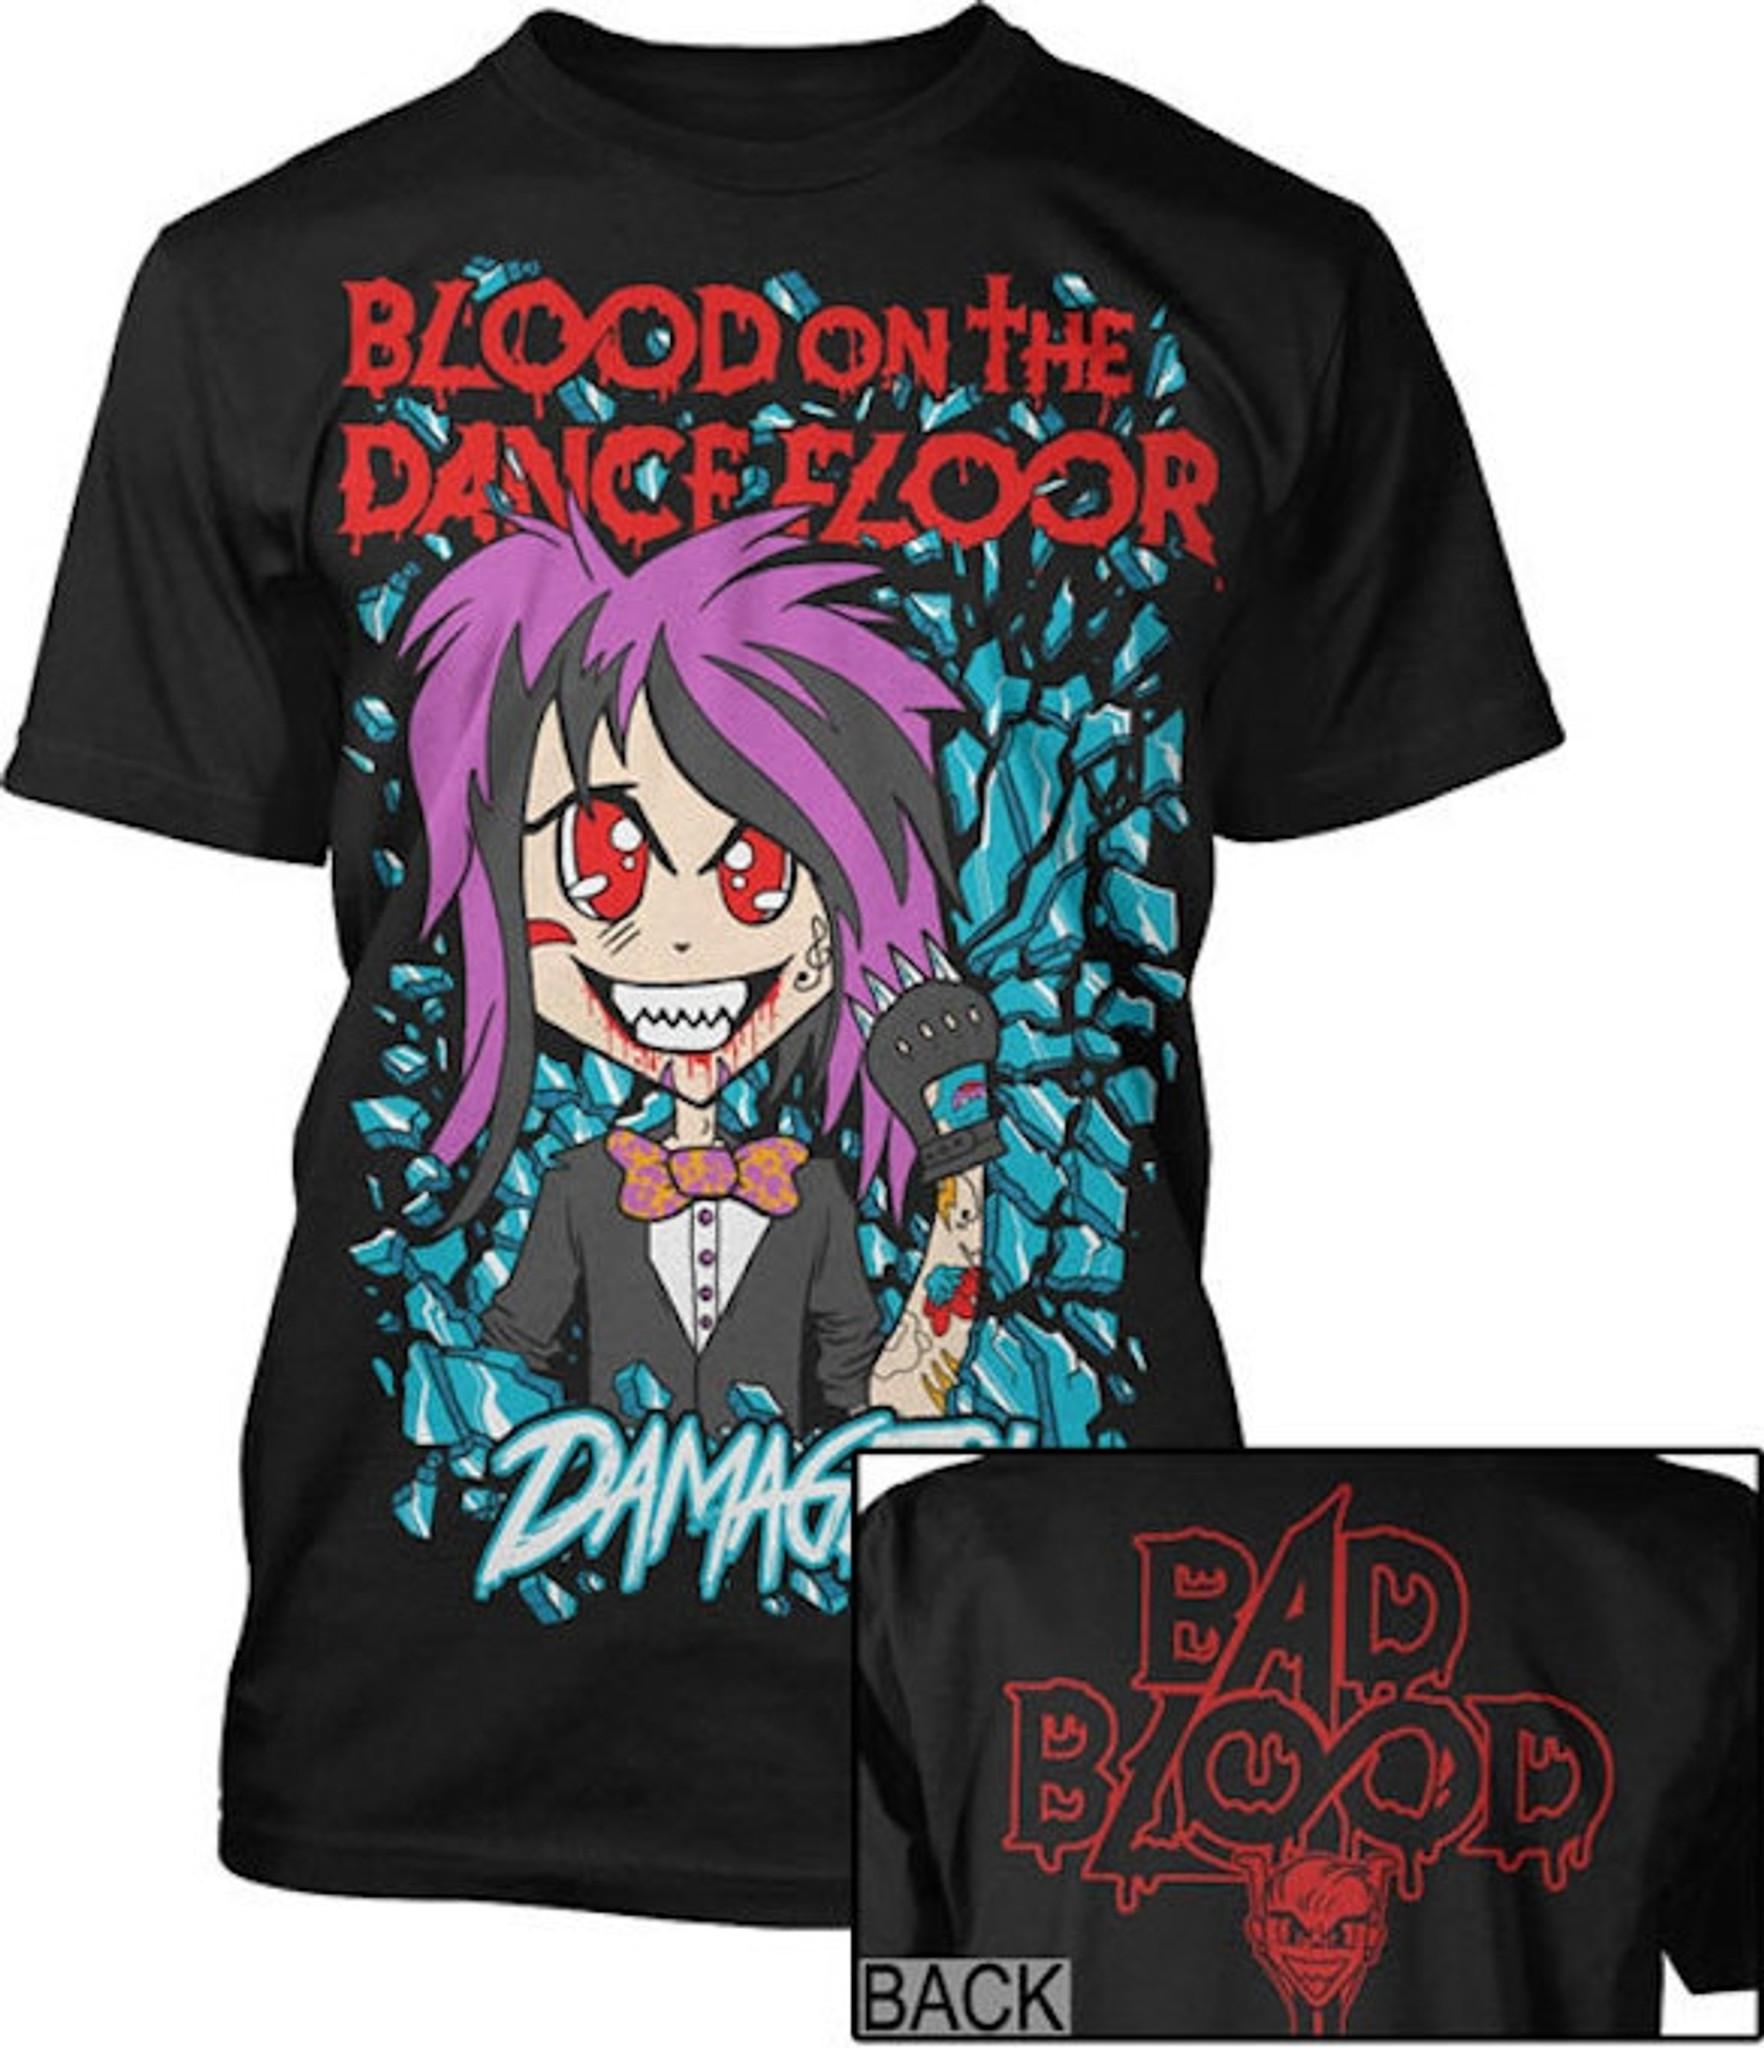 Blood On The Dance Floor Damaged T Shirt